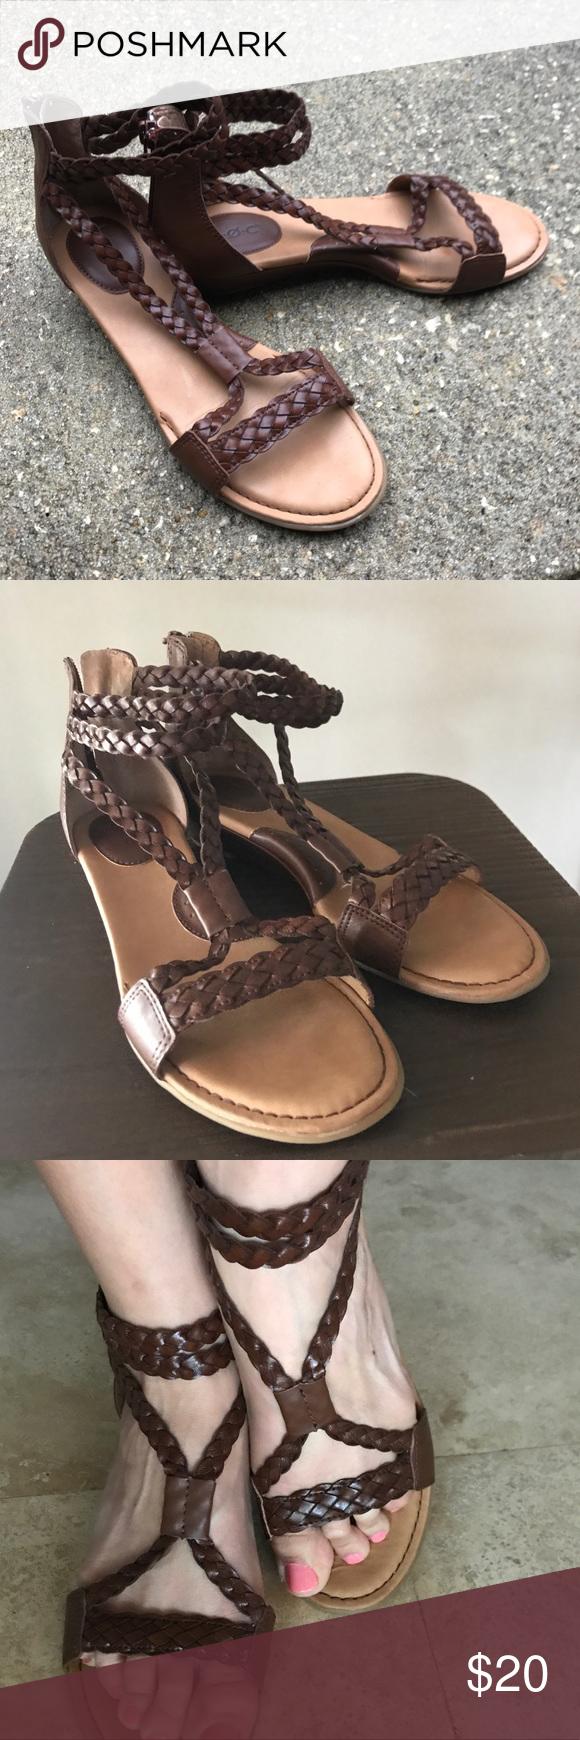 6ad1ed3c474 B.O.C Macedonia Gladiator Sandals Very lightly used. Like New Condition.  Beautiful brown